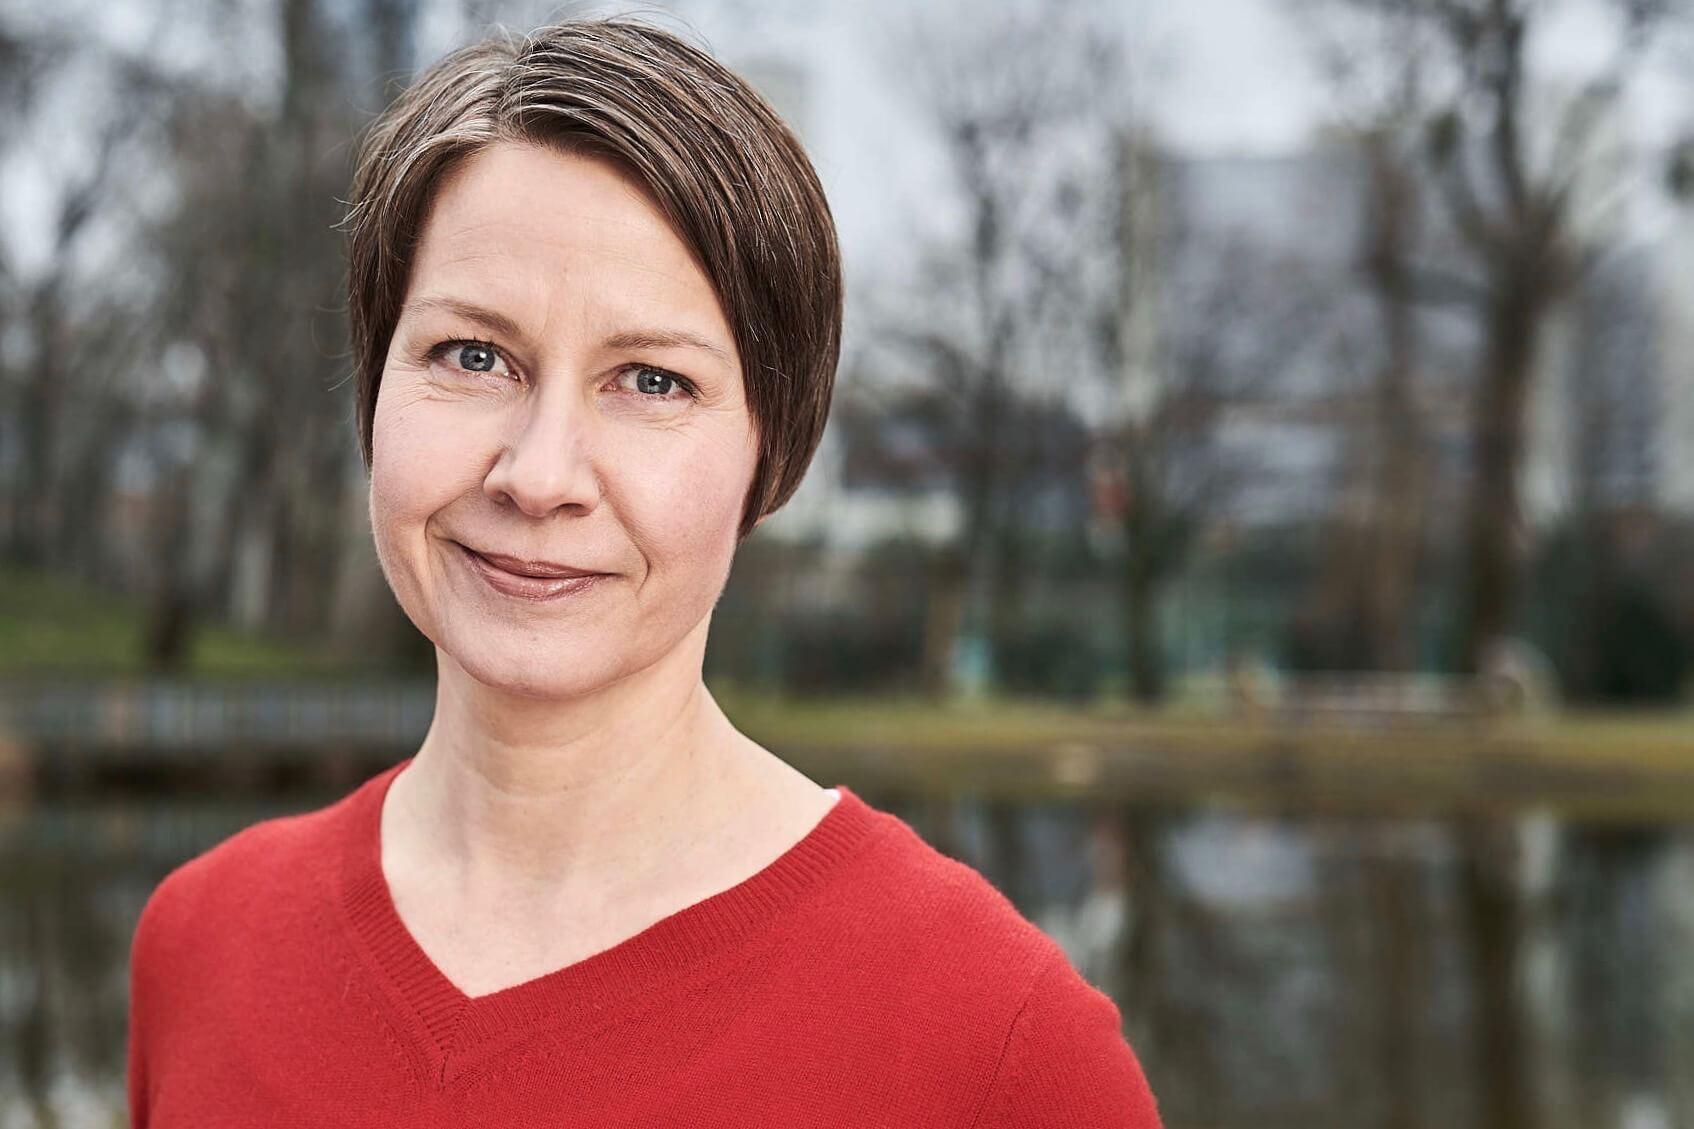 Susanne Lohs – Marketingcoach & Texterin von CommuniCare